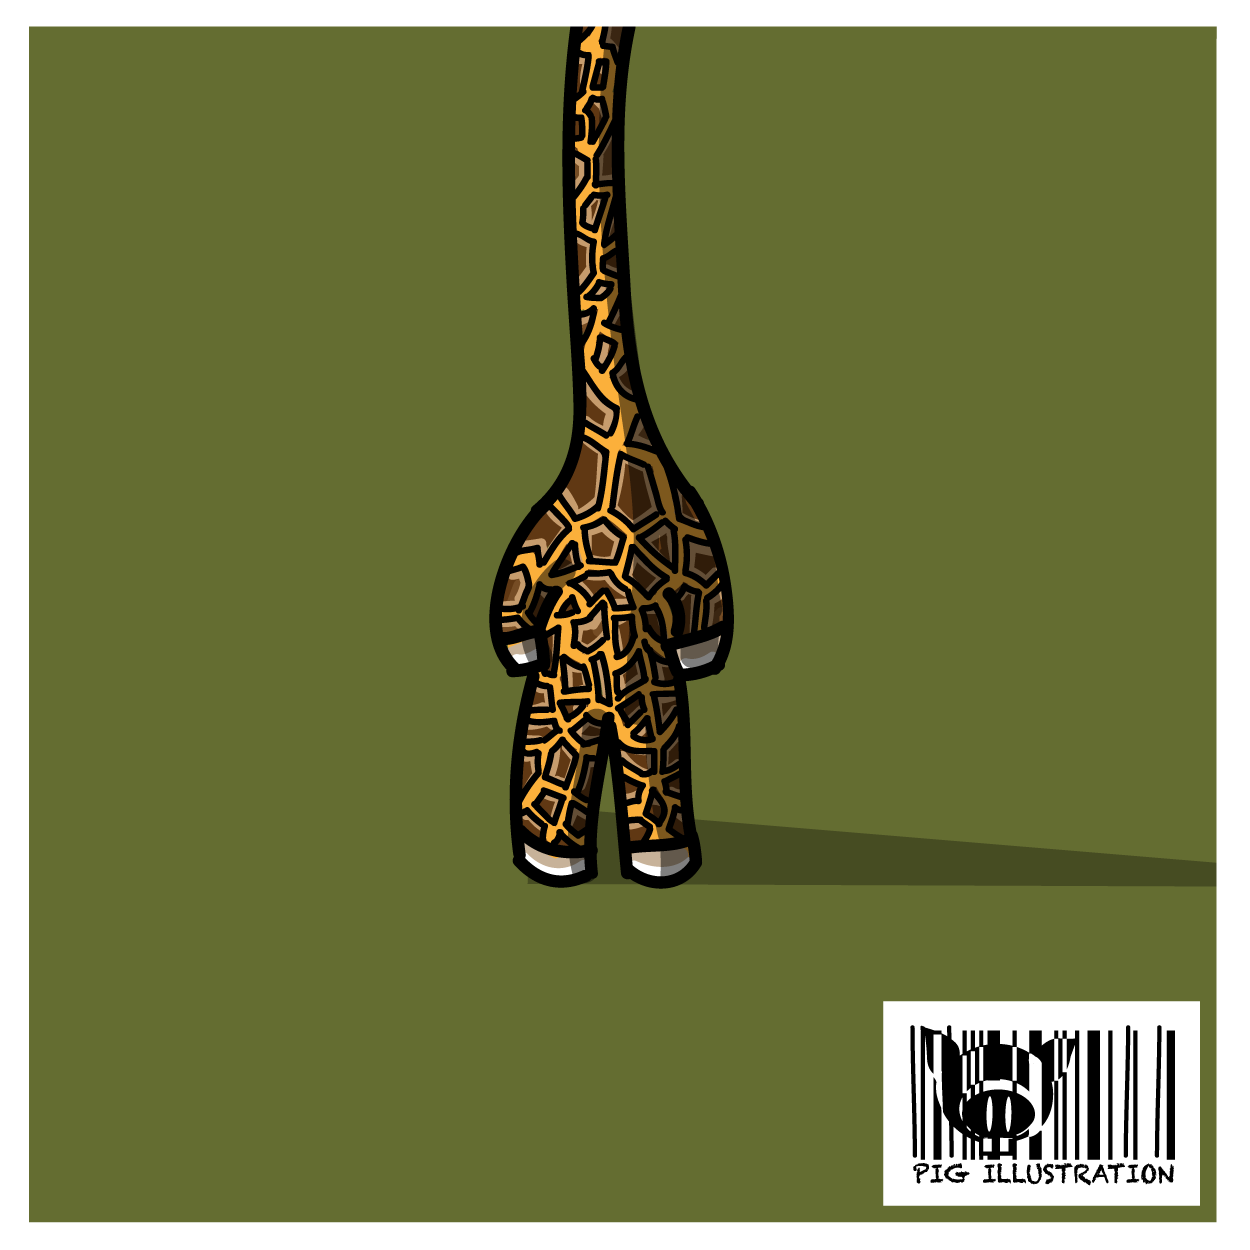 20181211.giraffe-01.png